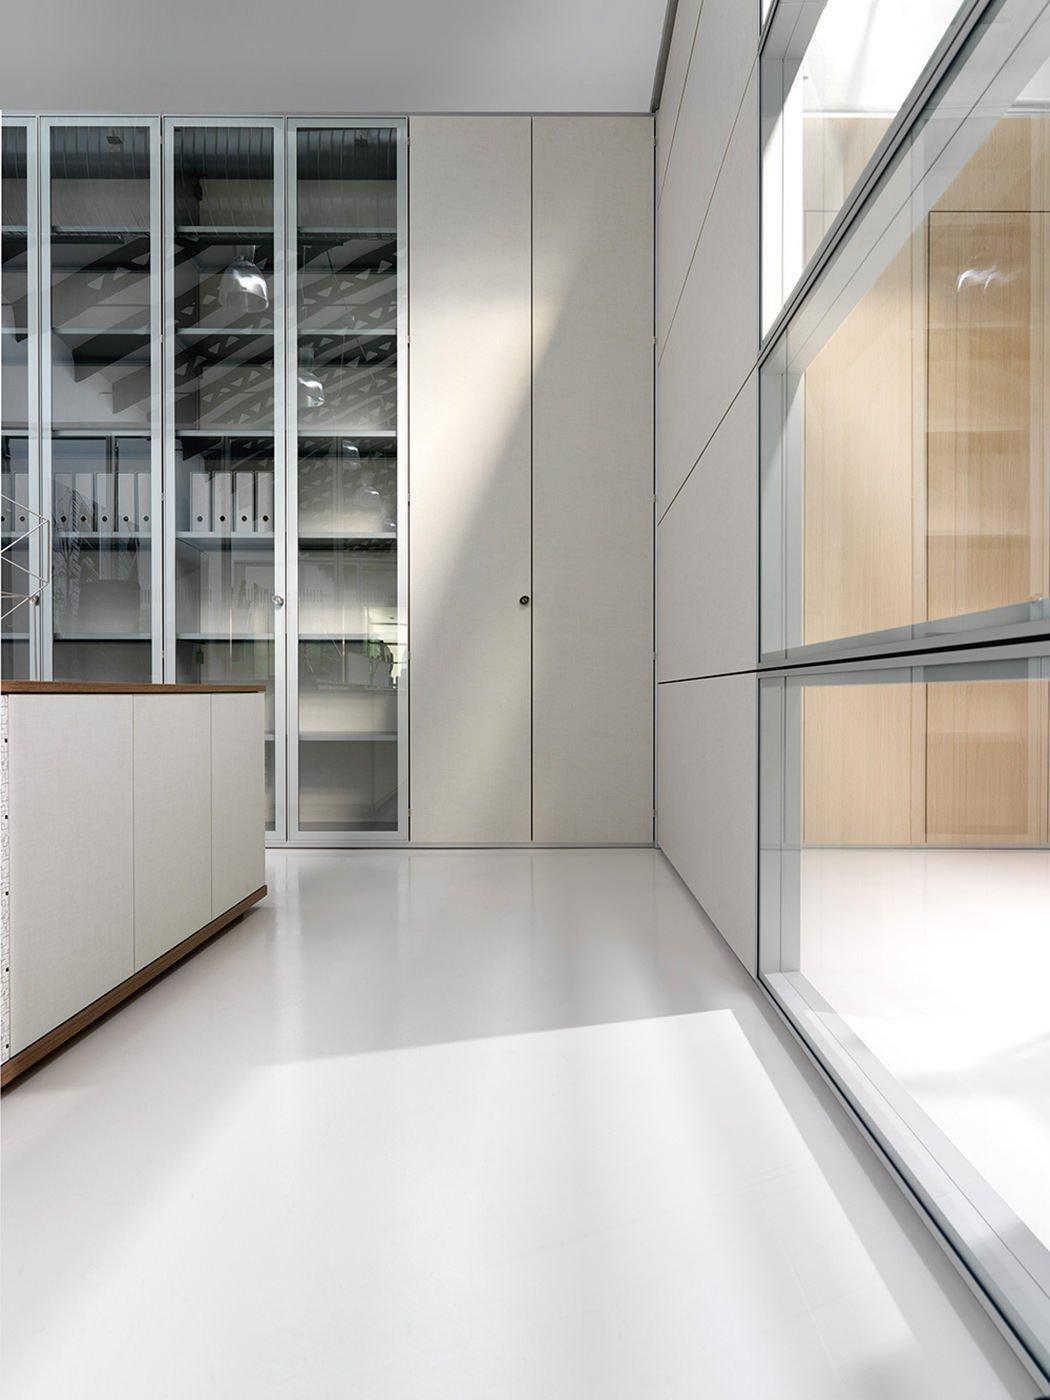 Boxwall7-1.jpg